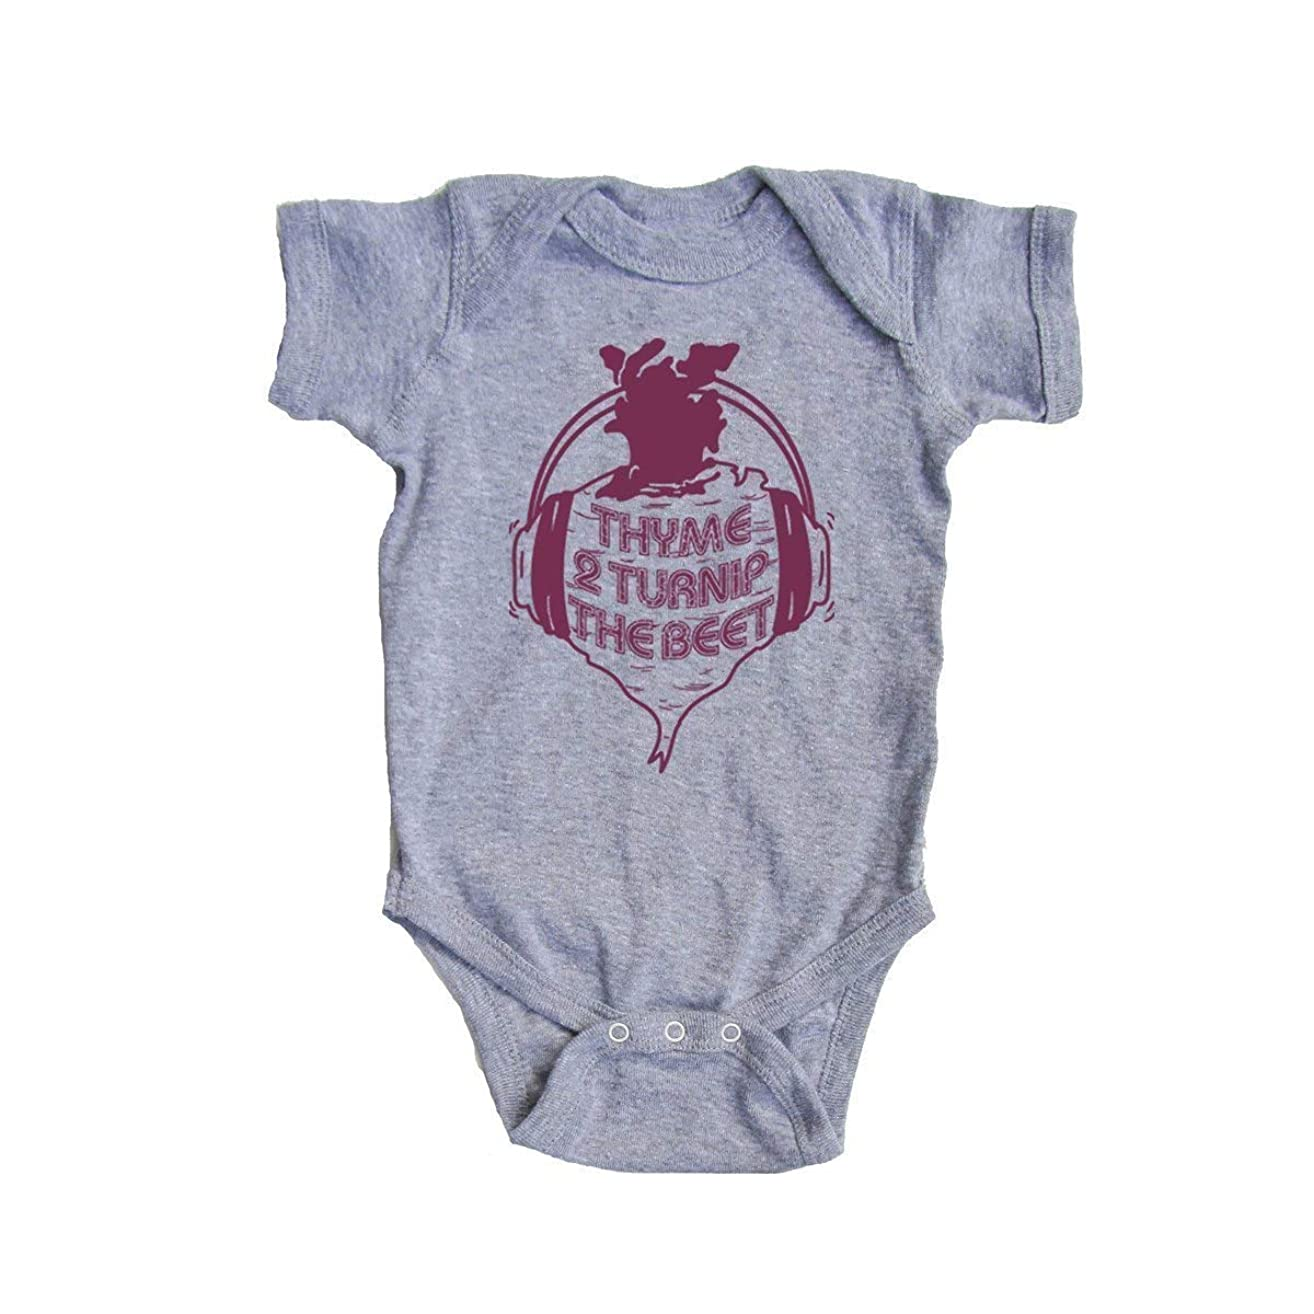 Baby Thyme to Turnip the Beet Onesie - Funny Vegan Bodysuit